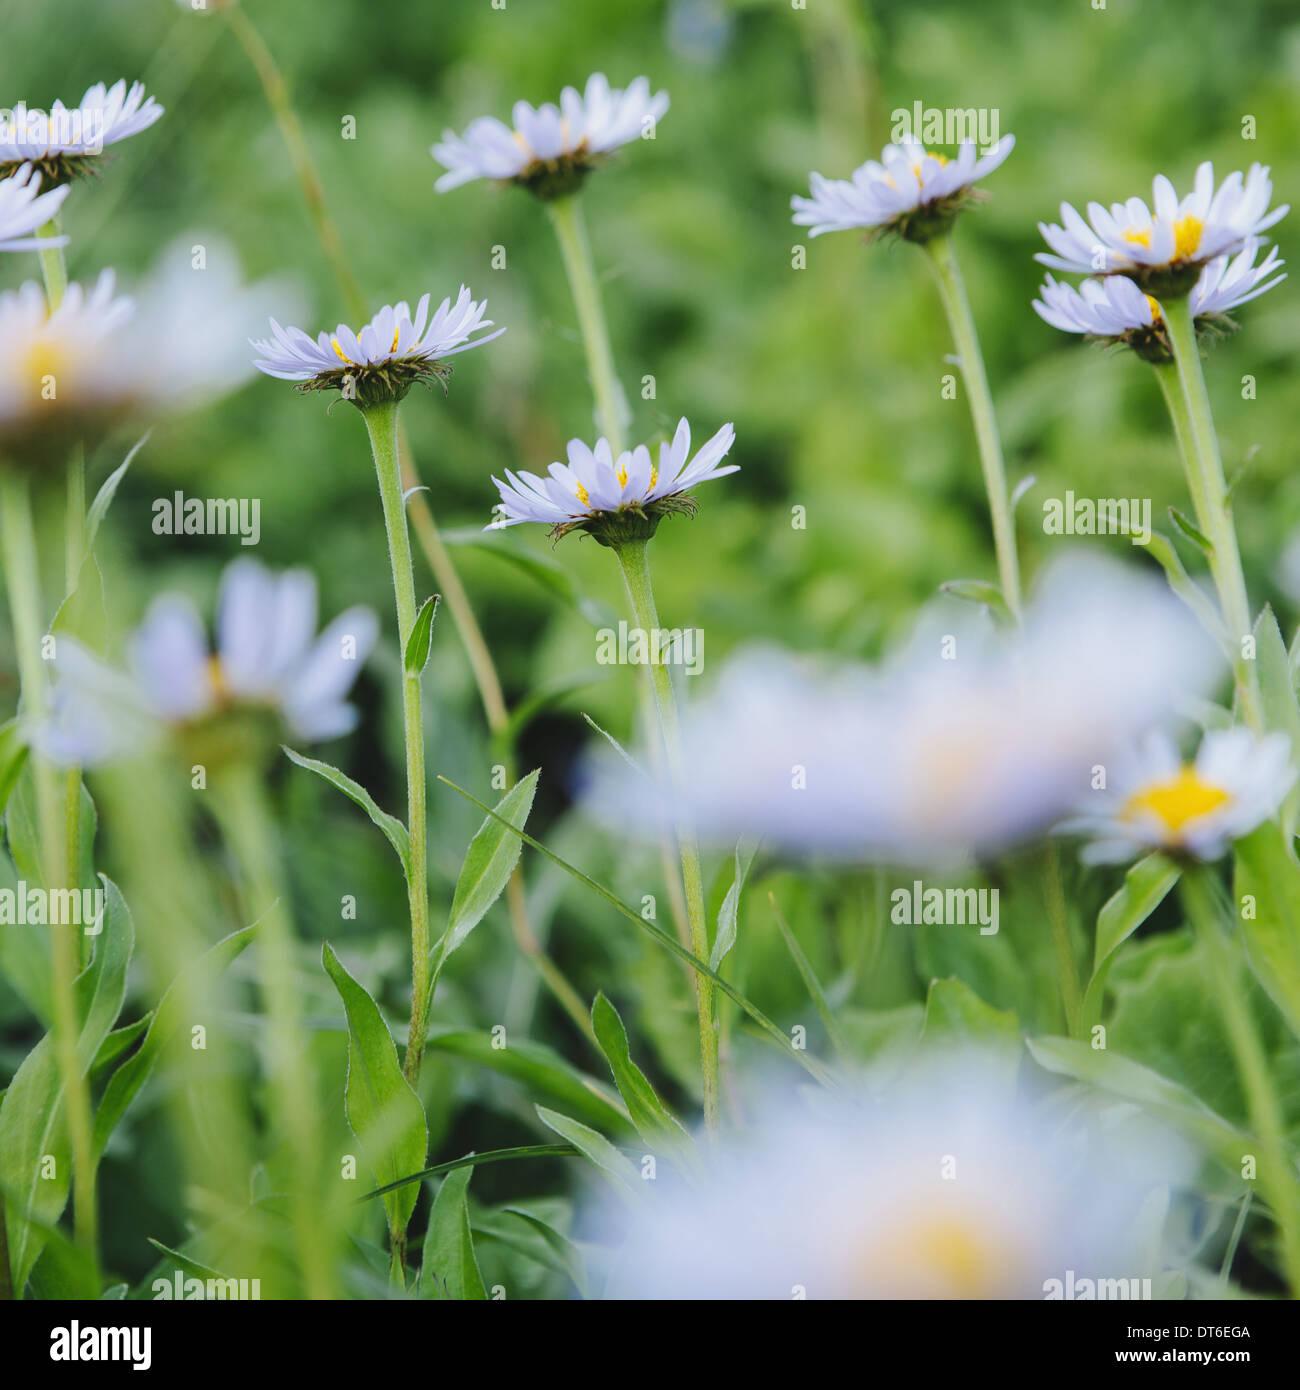 Daisy like flower stock photos daisy like flower stock images alamy alpine asters daisy like flowers in lush green meadow at mount rainier national park izmirmasajfo